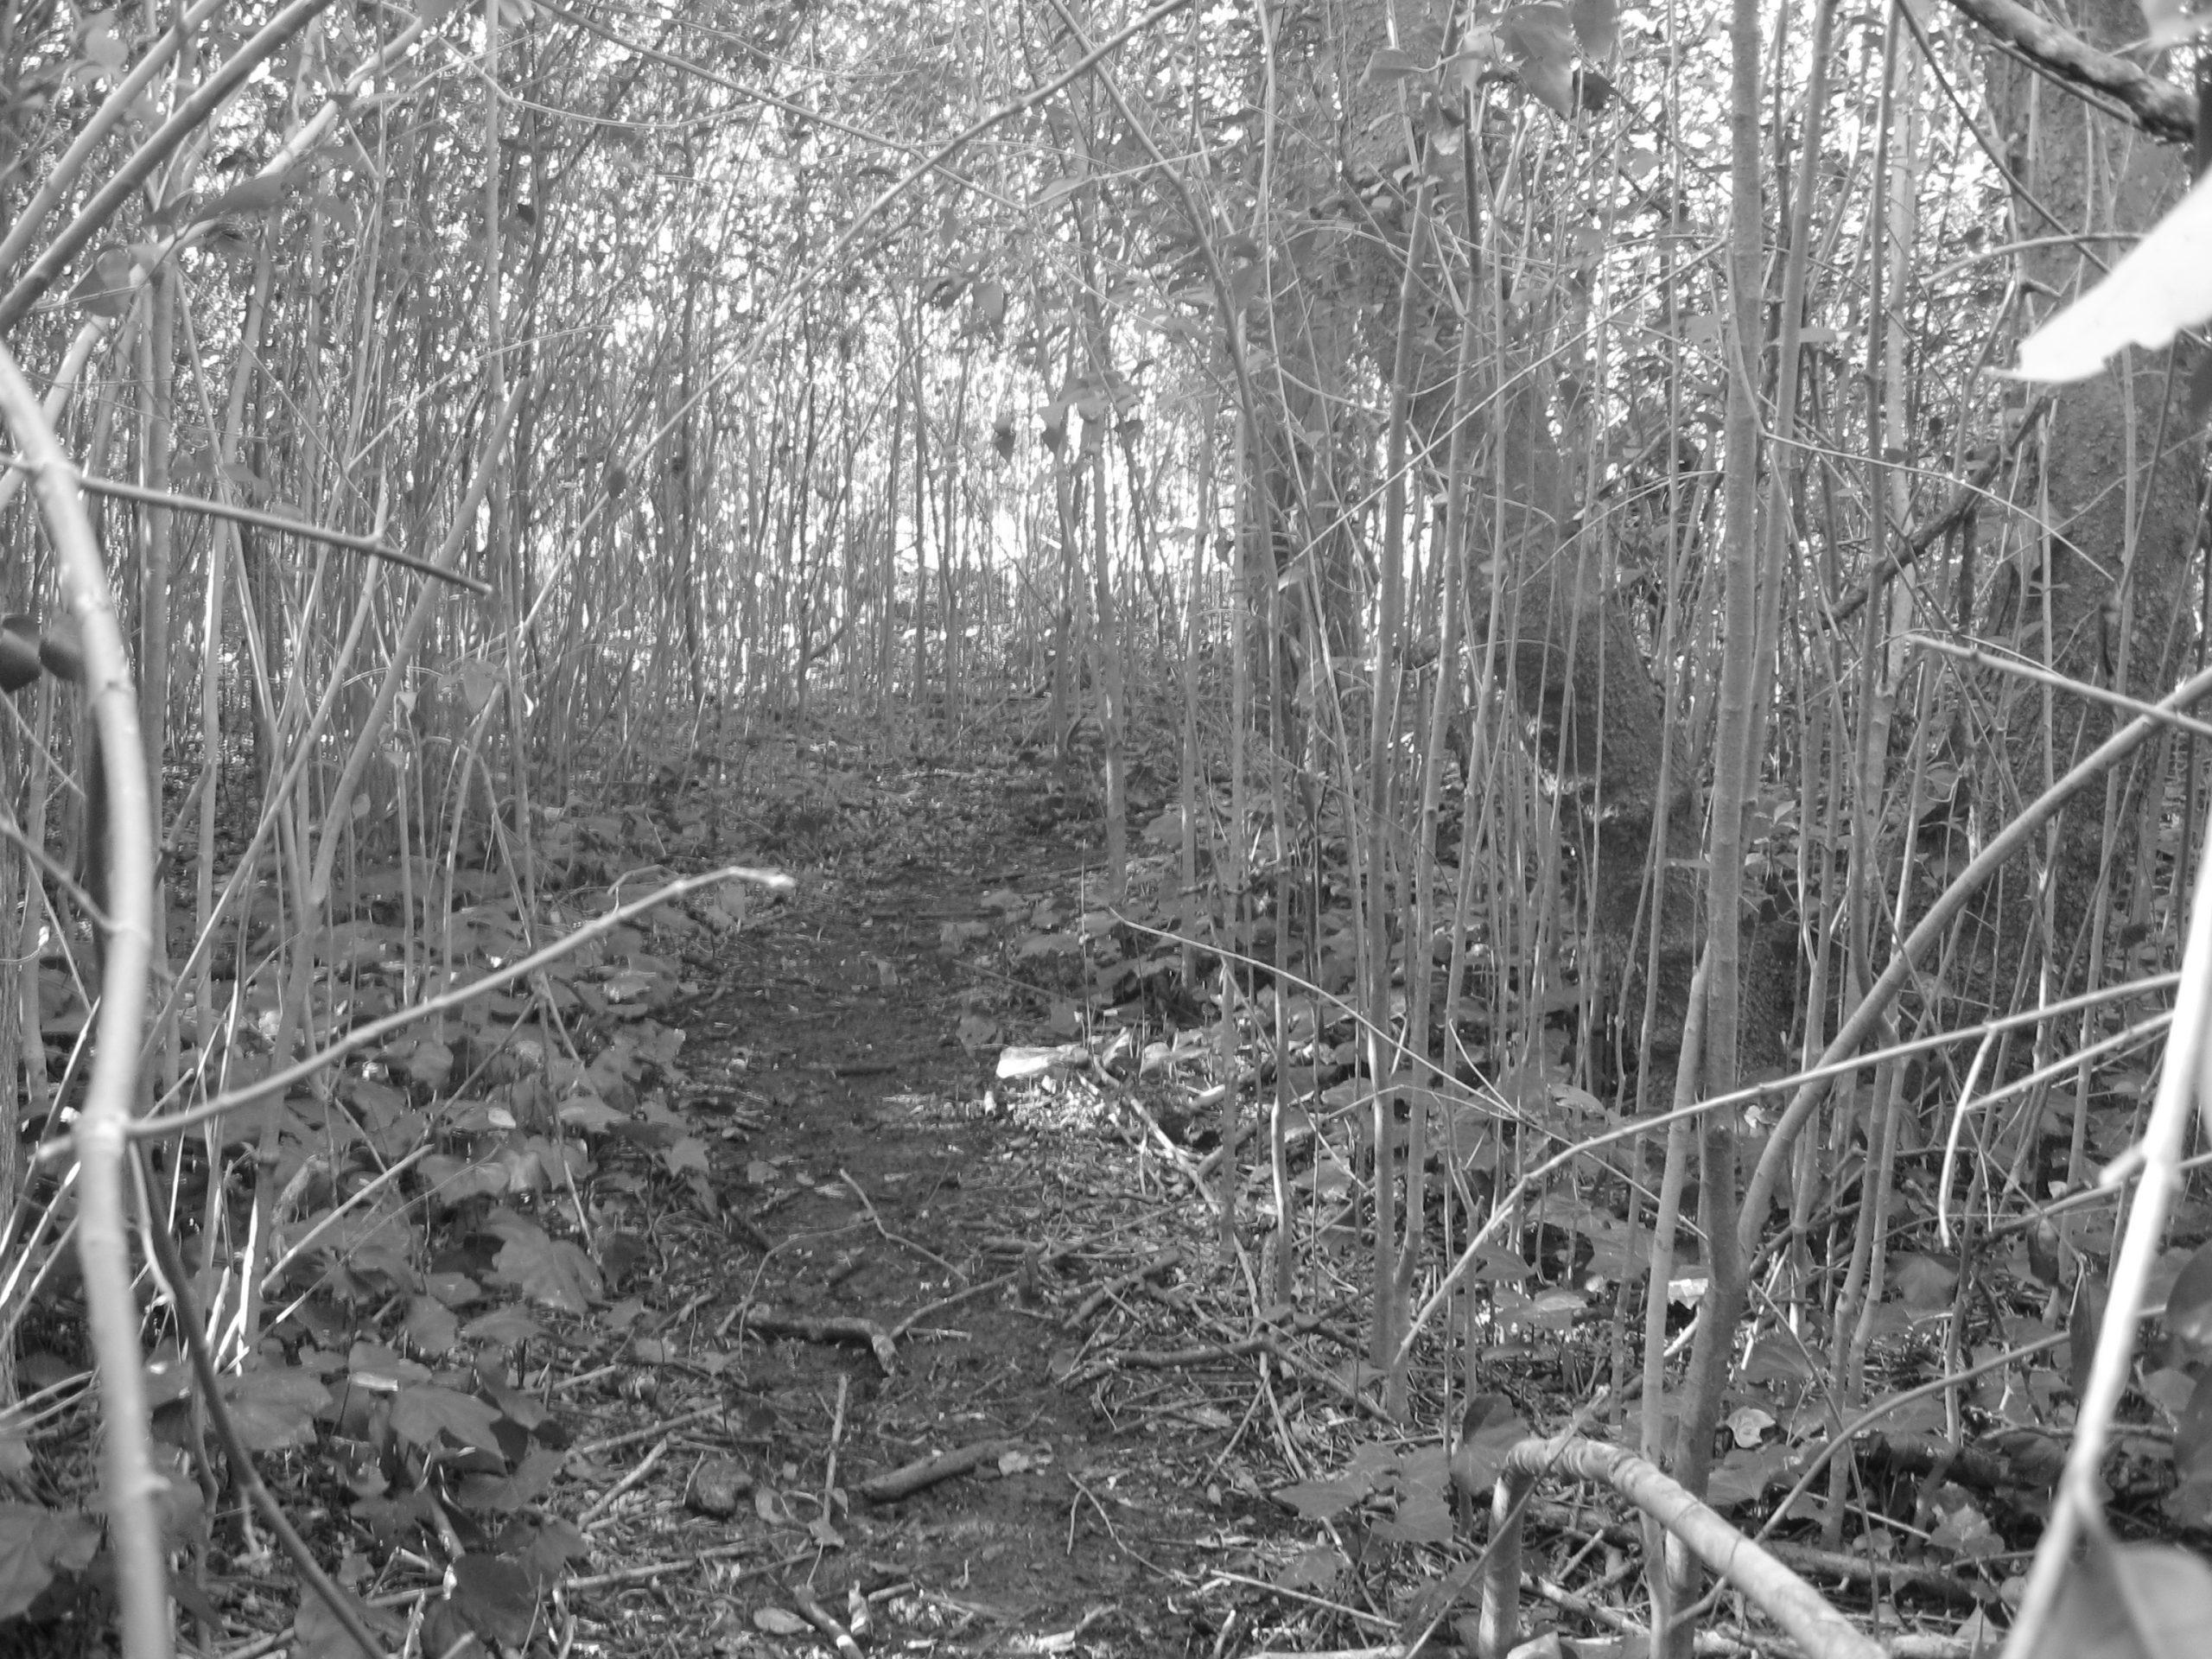 foliage black and white